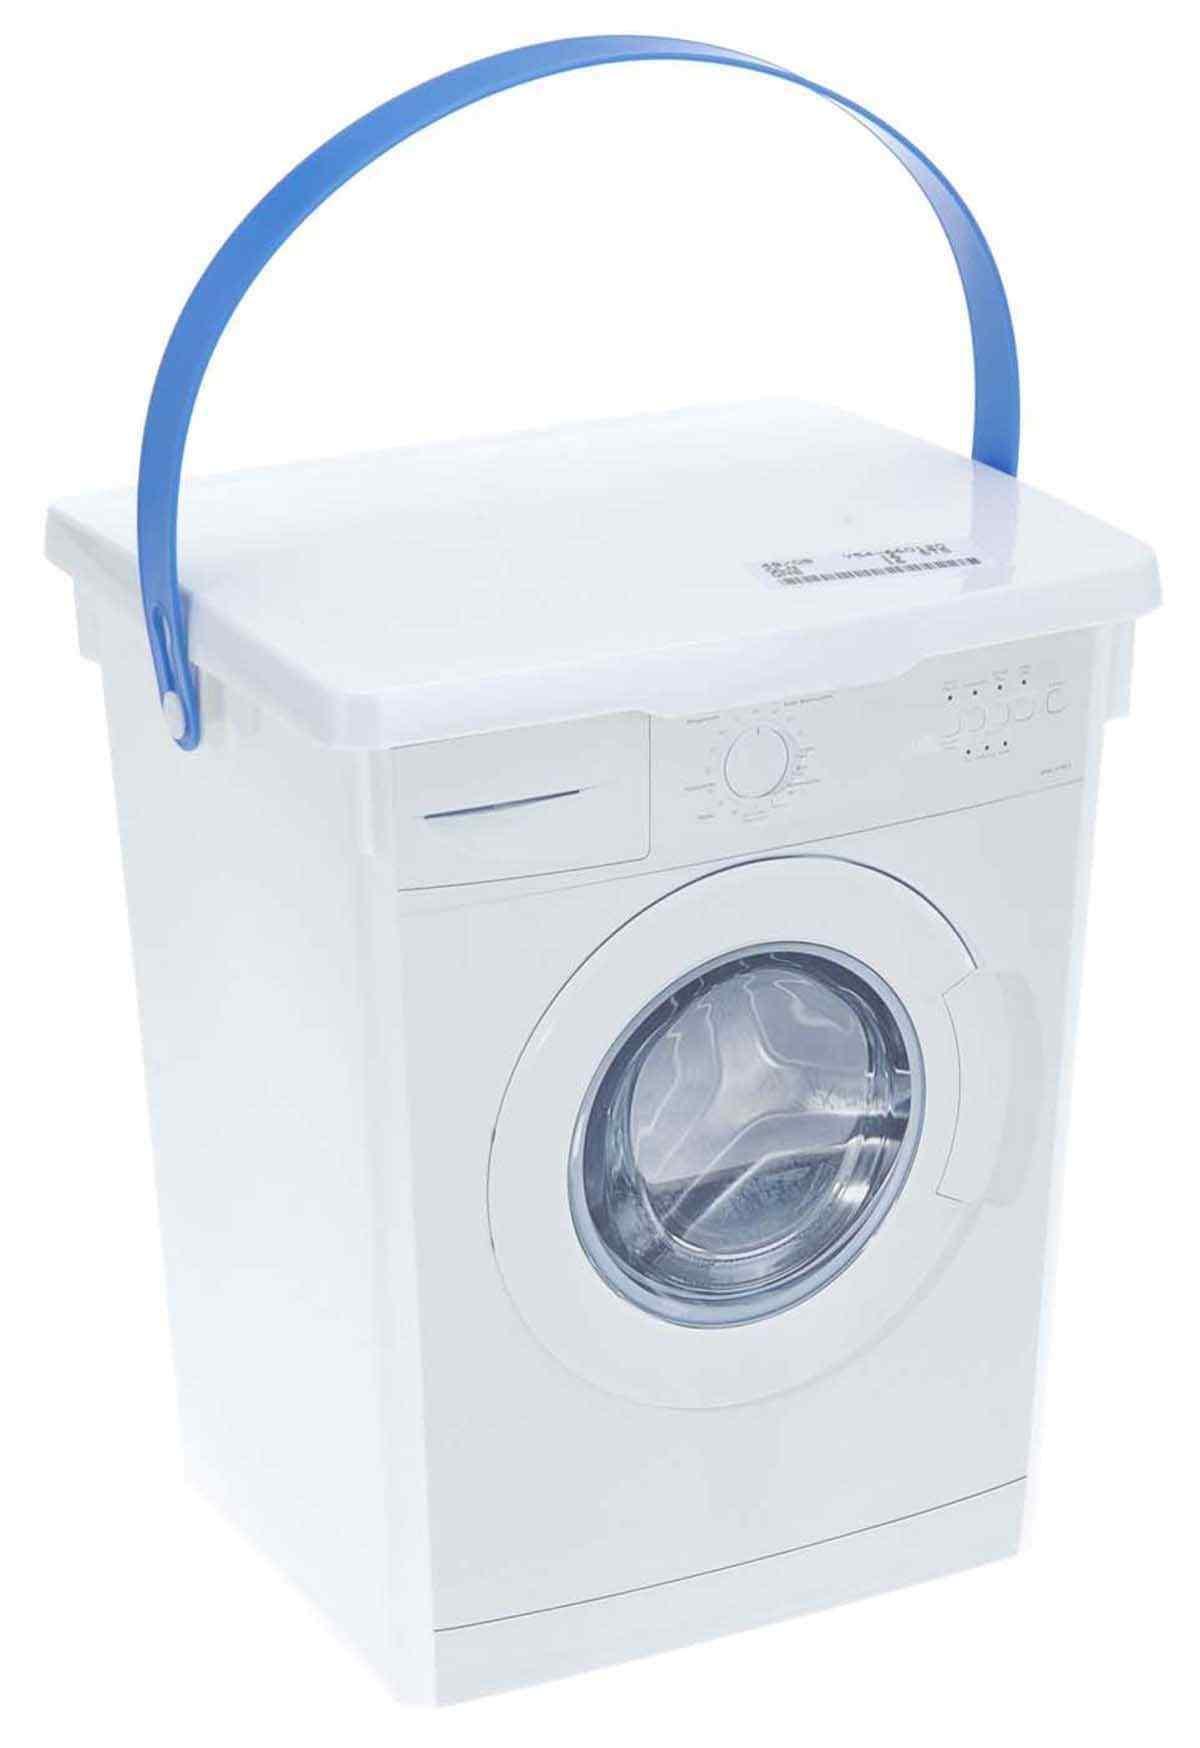 Plastic Laundry Dishwasher Washing Powder Tablet Detergent Storage